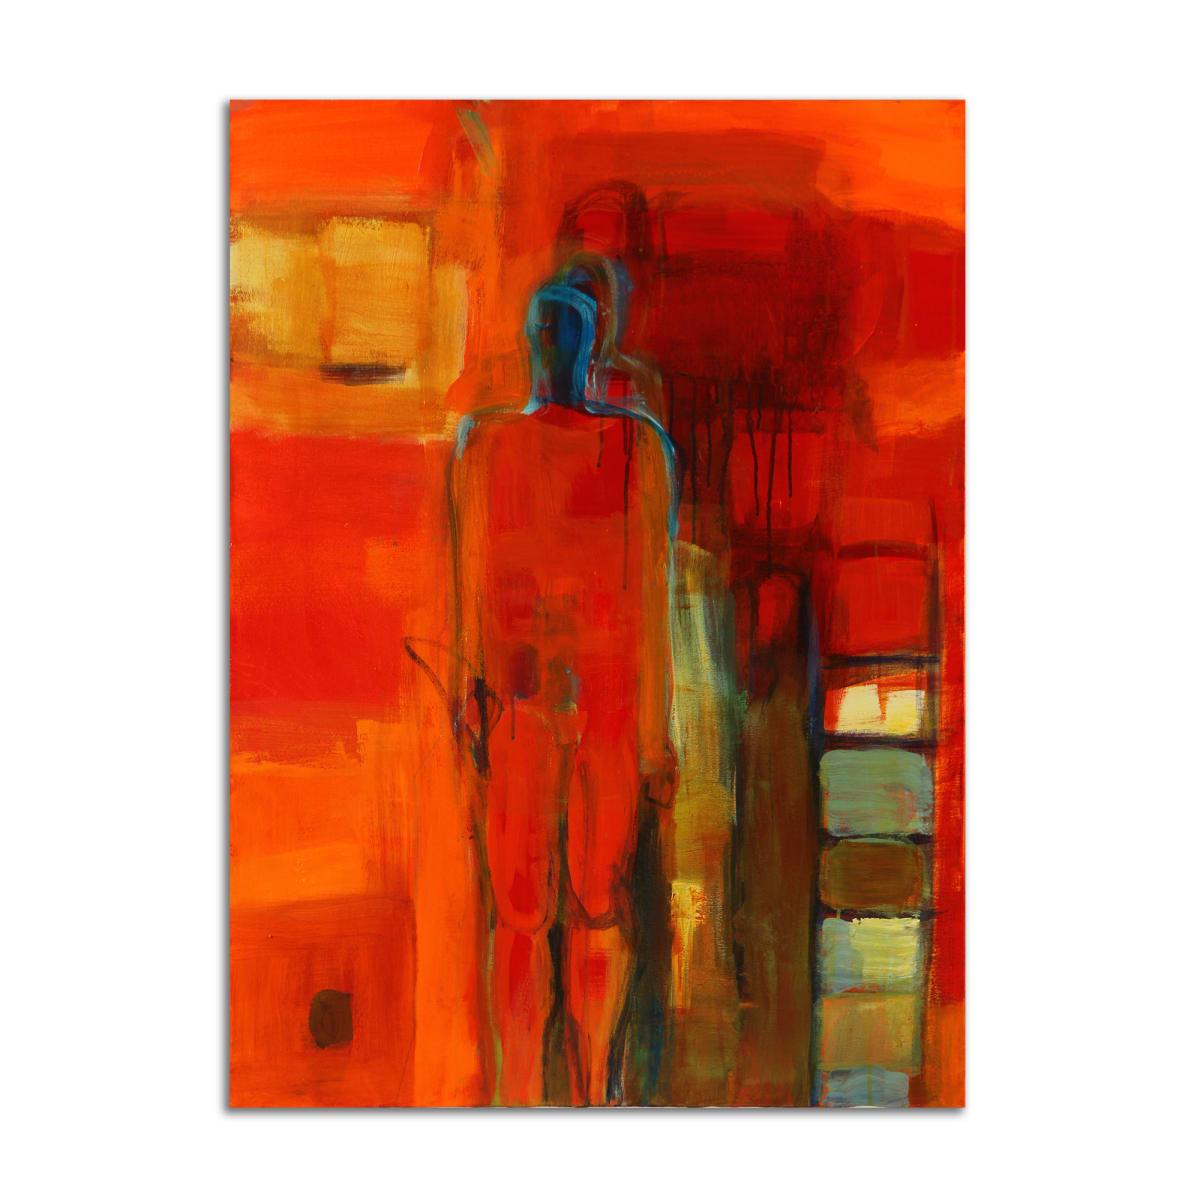 Seeking by Stephanie Cramer